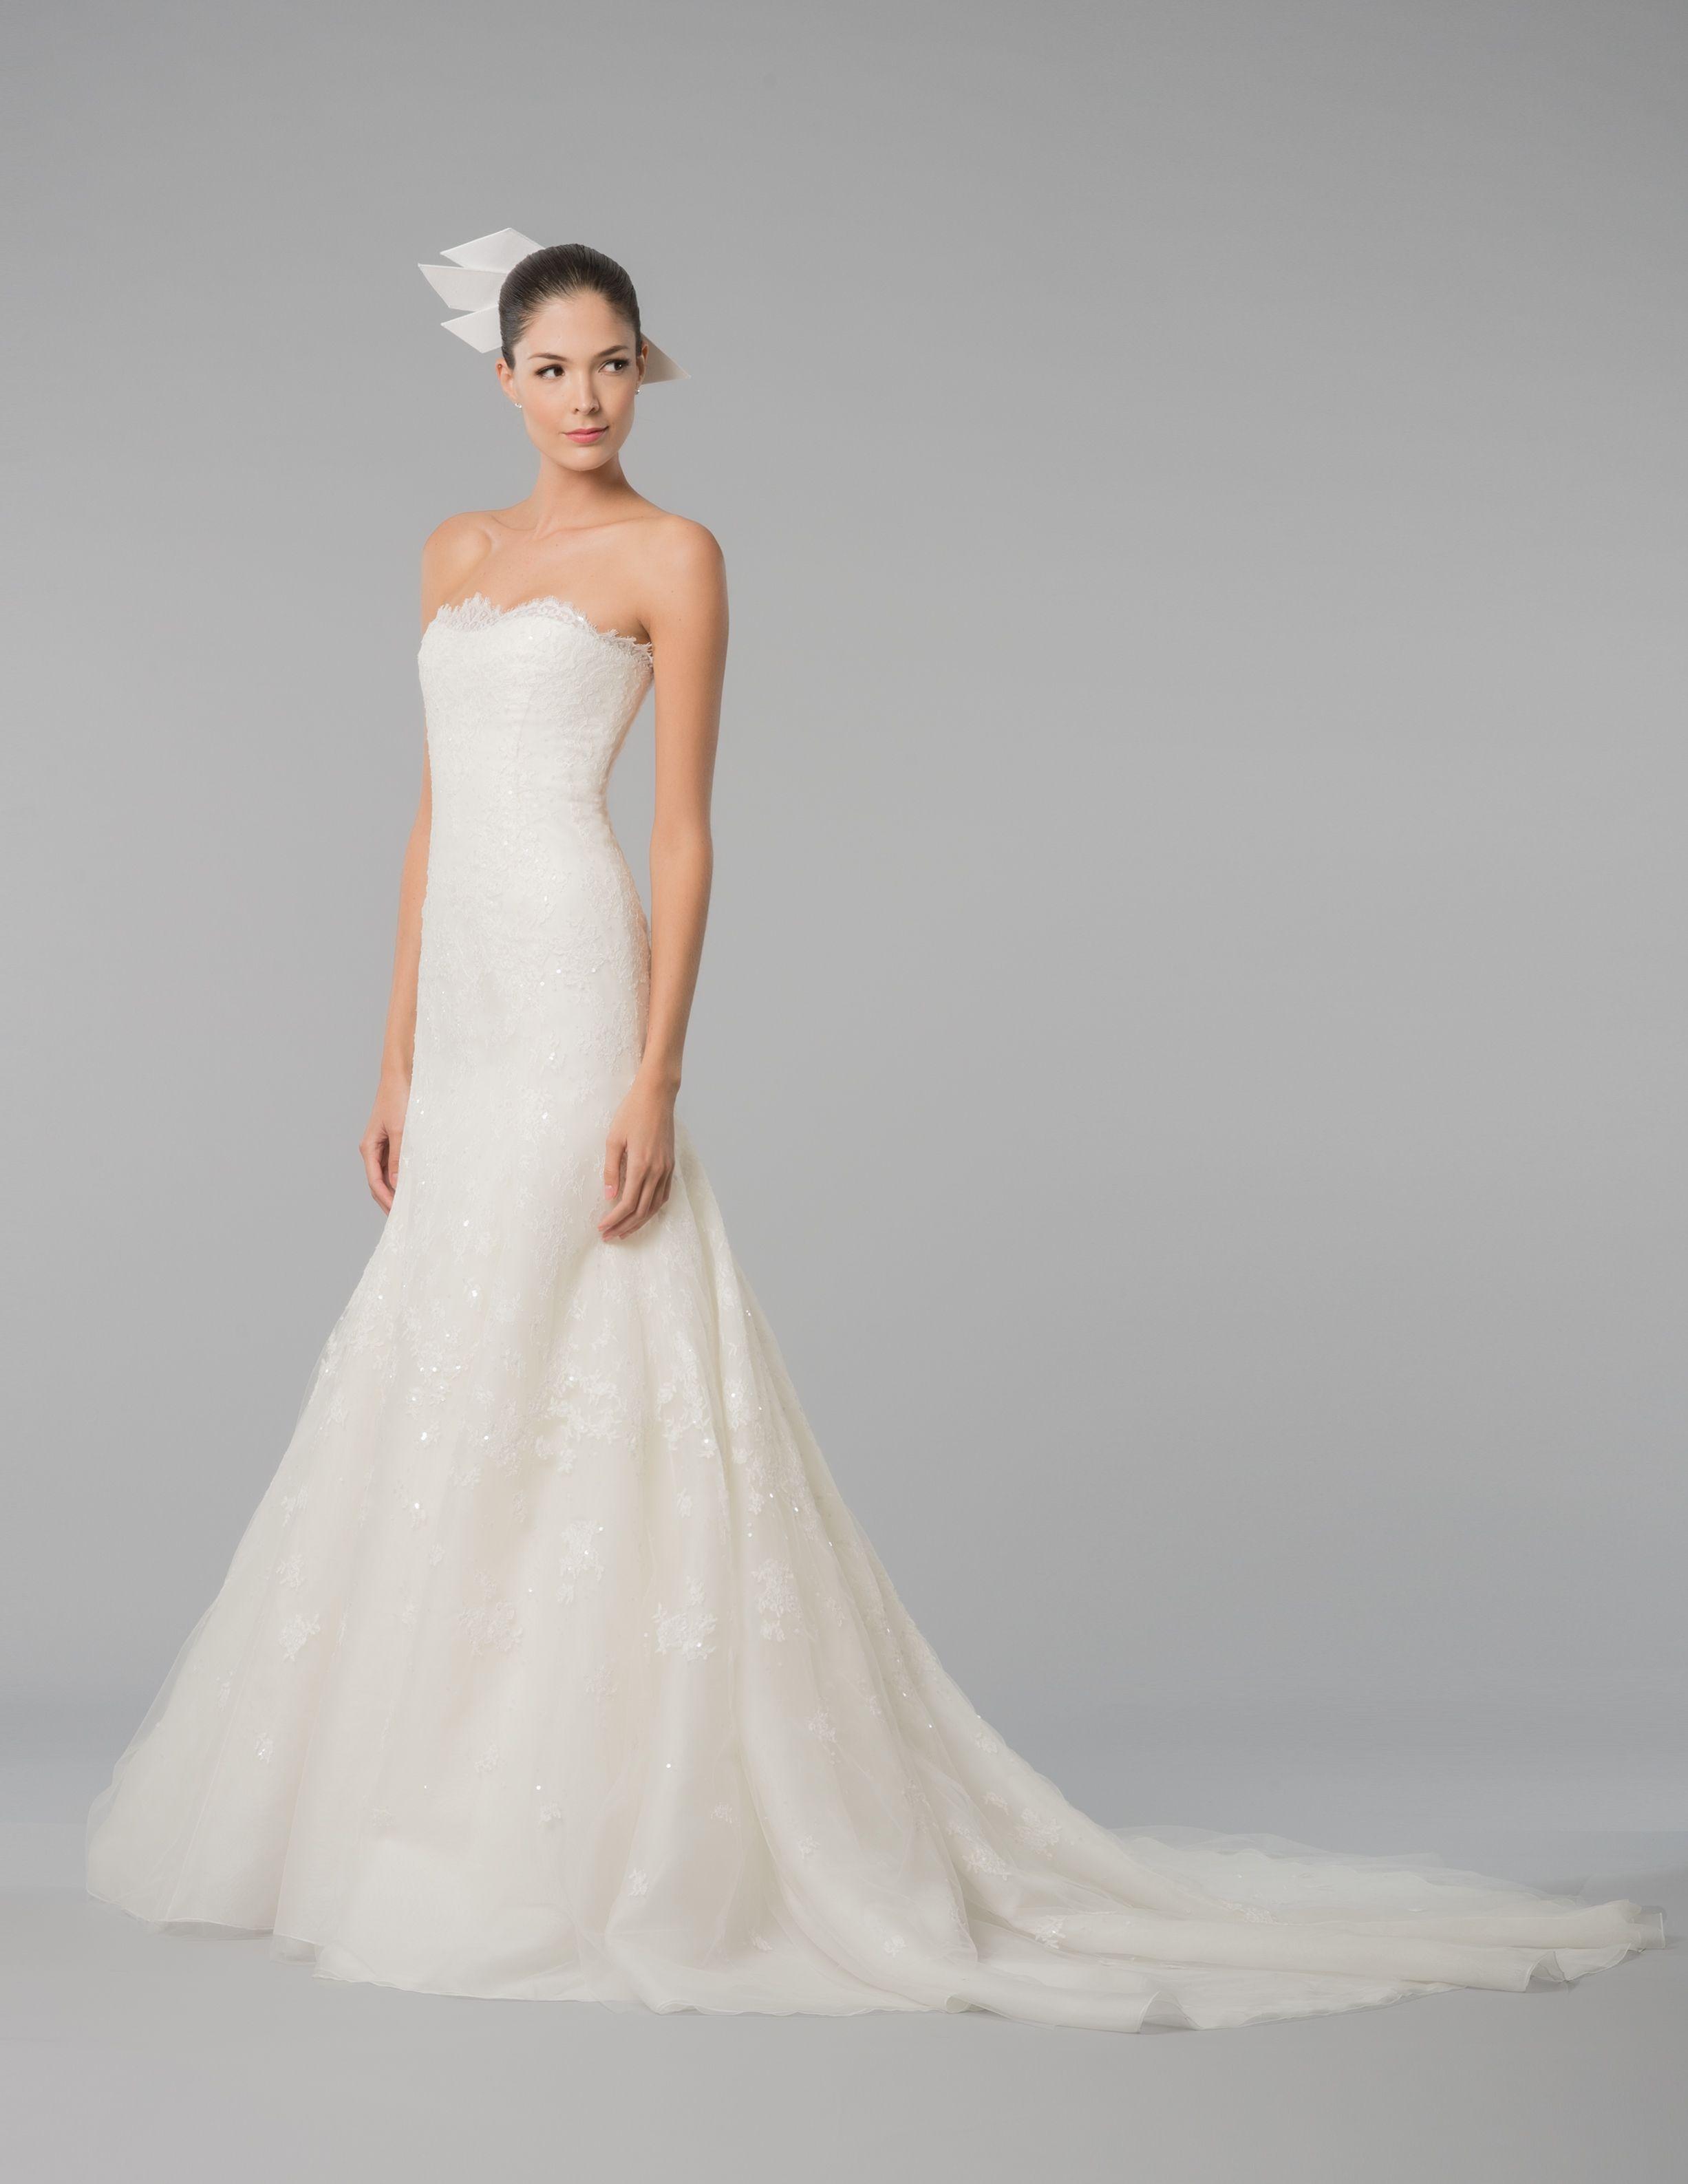 Twirl New York Spring 2015 | Carolina herrera, 2016 wedding dresses ...